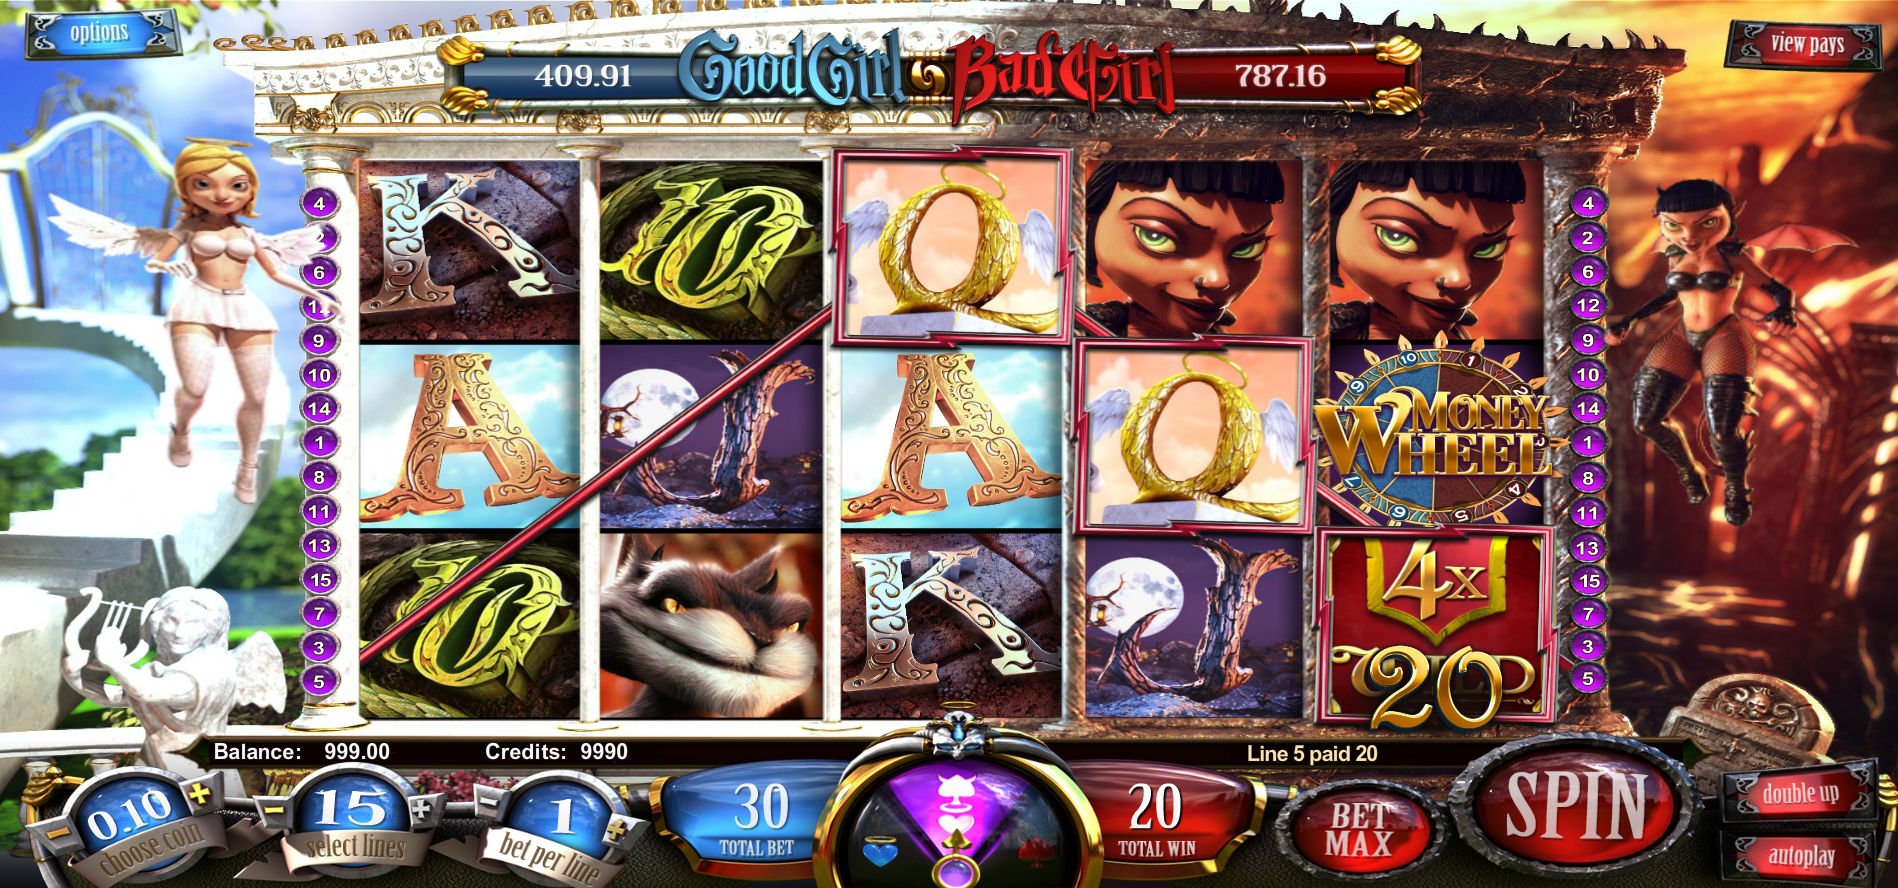 Online Casino Games Live Blackjack My Bookie Casino Play